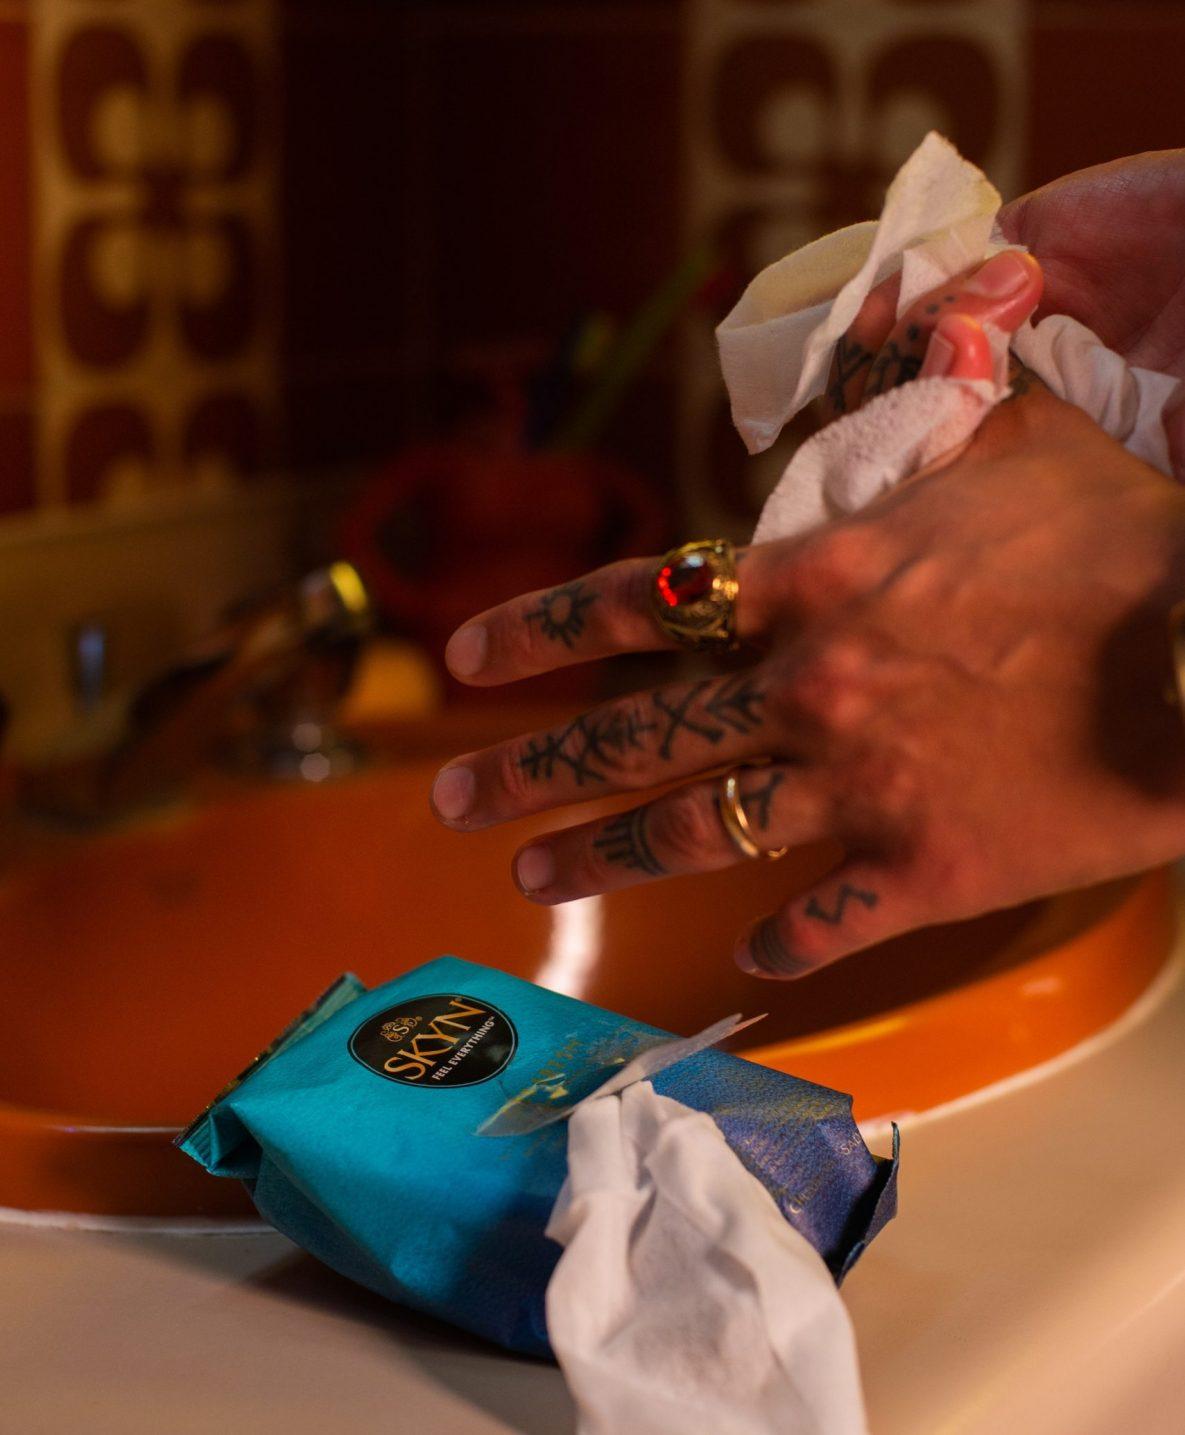 Tattooed hands cleaned by a SKYN Get Fresh wipe